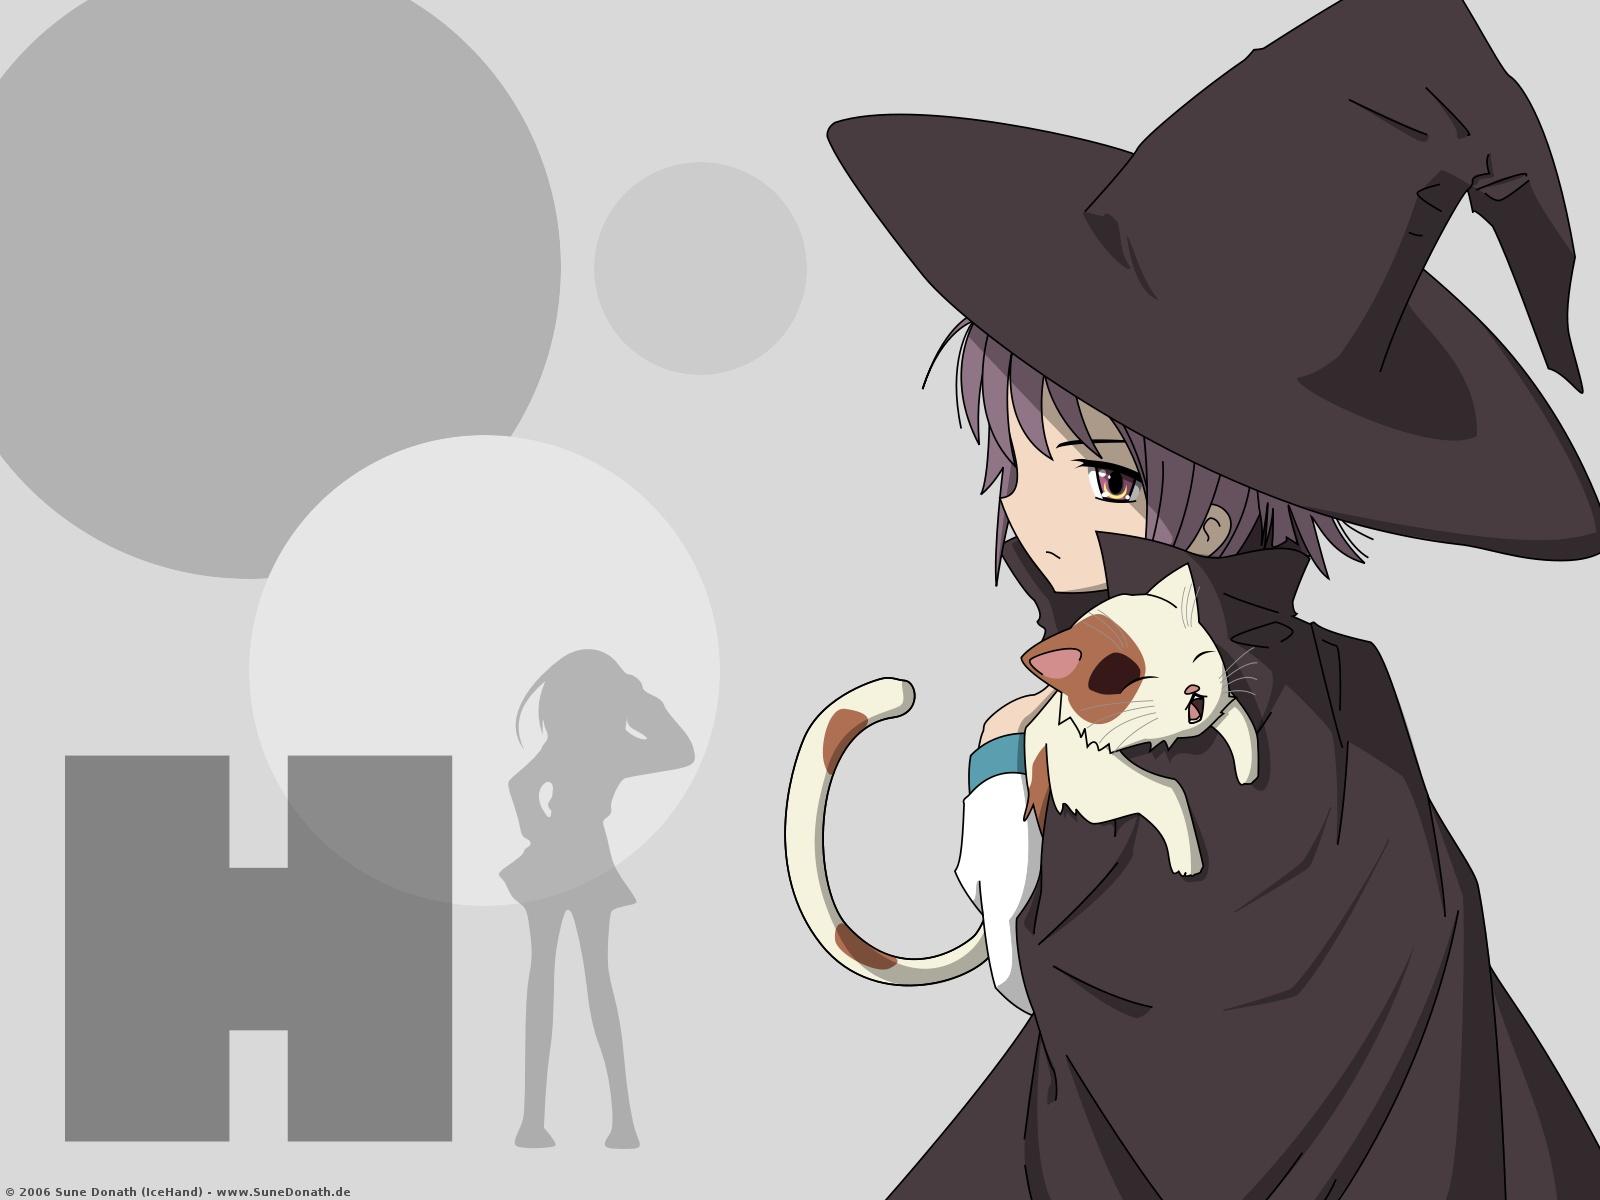 animal cat nagato_yuki shamisen suzumiya_haruhi suzumiya_haruhi_no_yuutsu witch